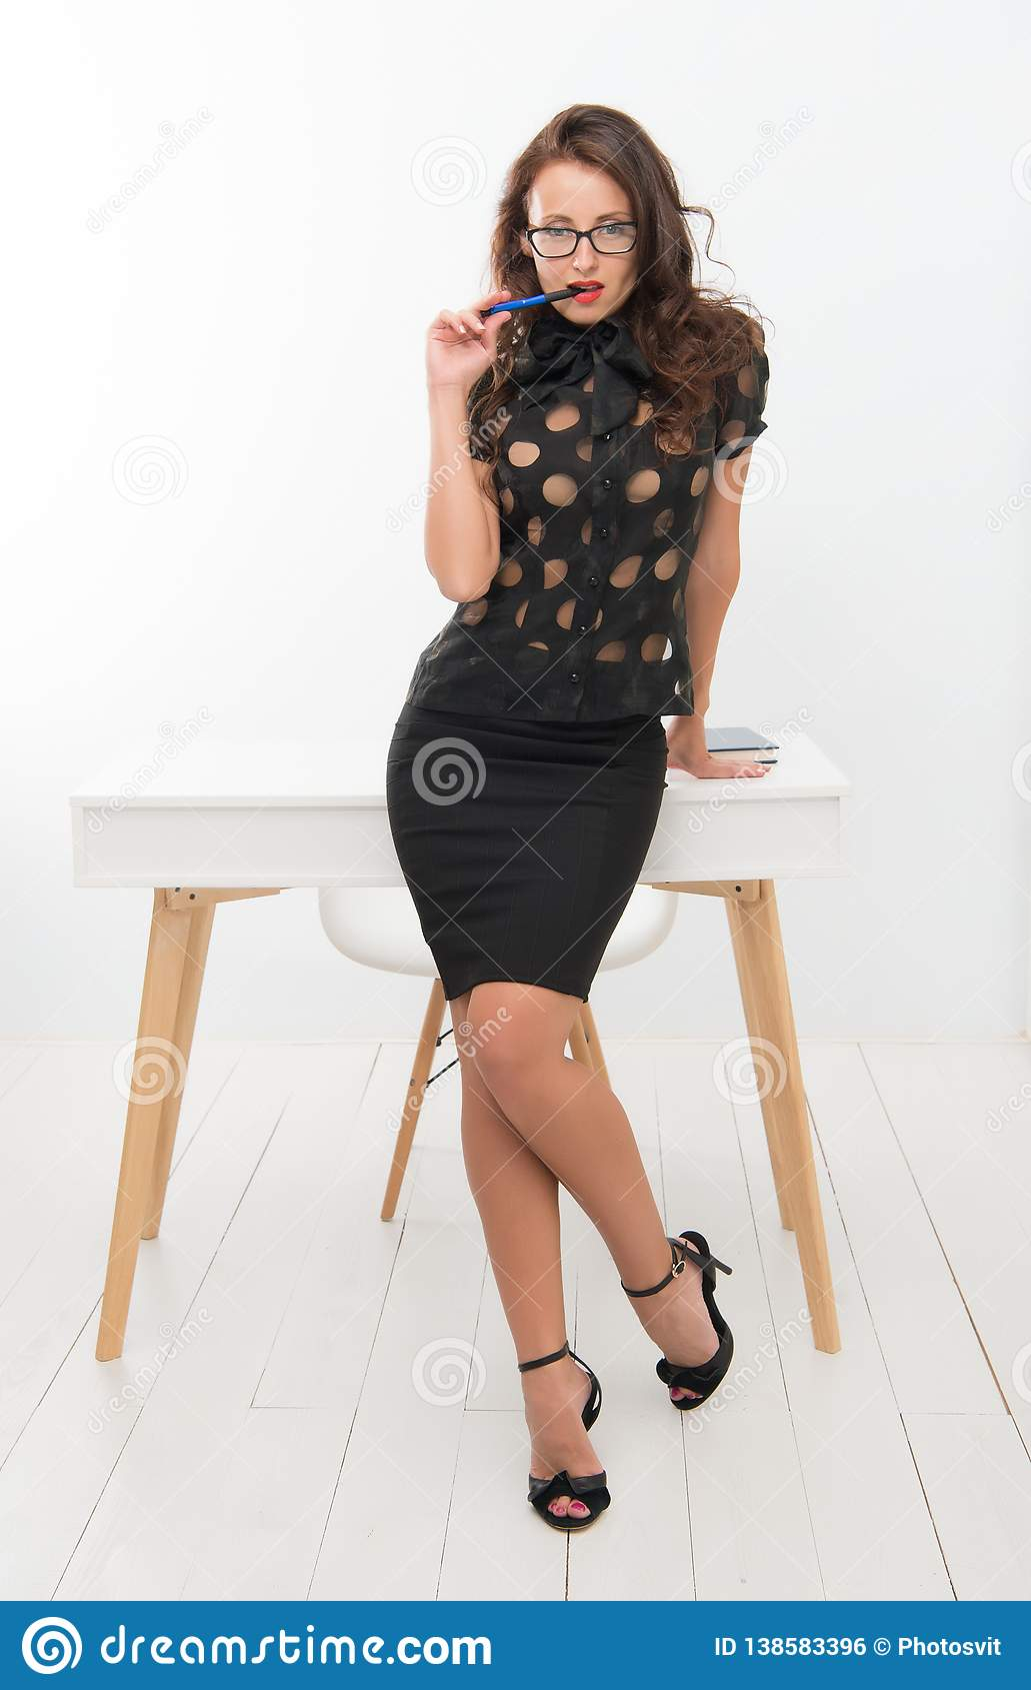 Fashion is her life. businesswoman. Pretty school teacher or student. Business school coach. Dress code. Fashion